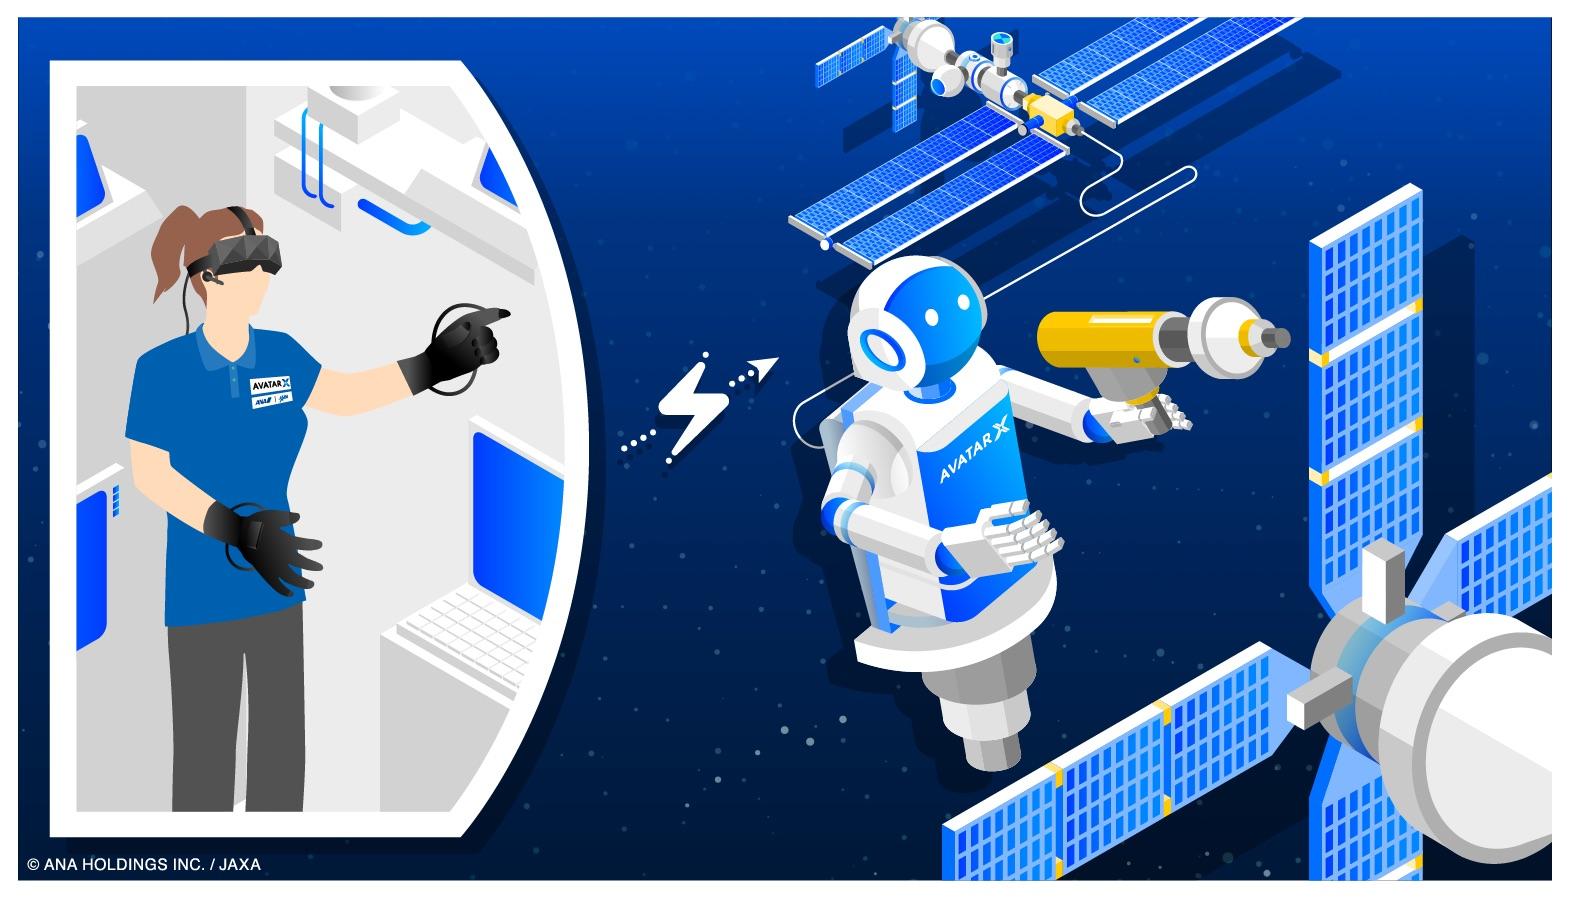 ANAが瞬間移動で宇宙事業へ、アバターでJAXAらと新組織結成、アニメ「宇宙兄弟」の世界観の実現にも意欲